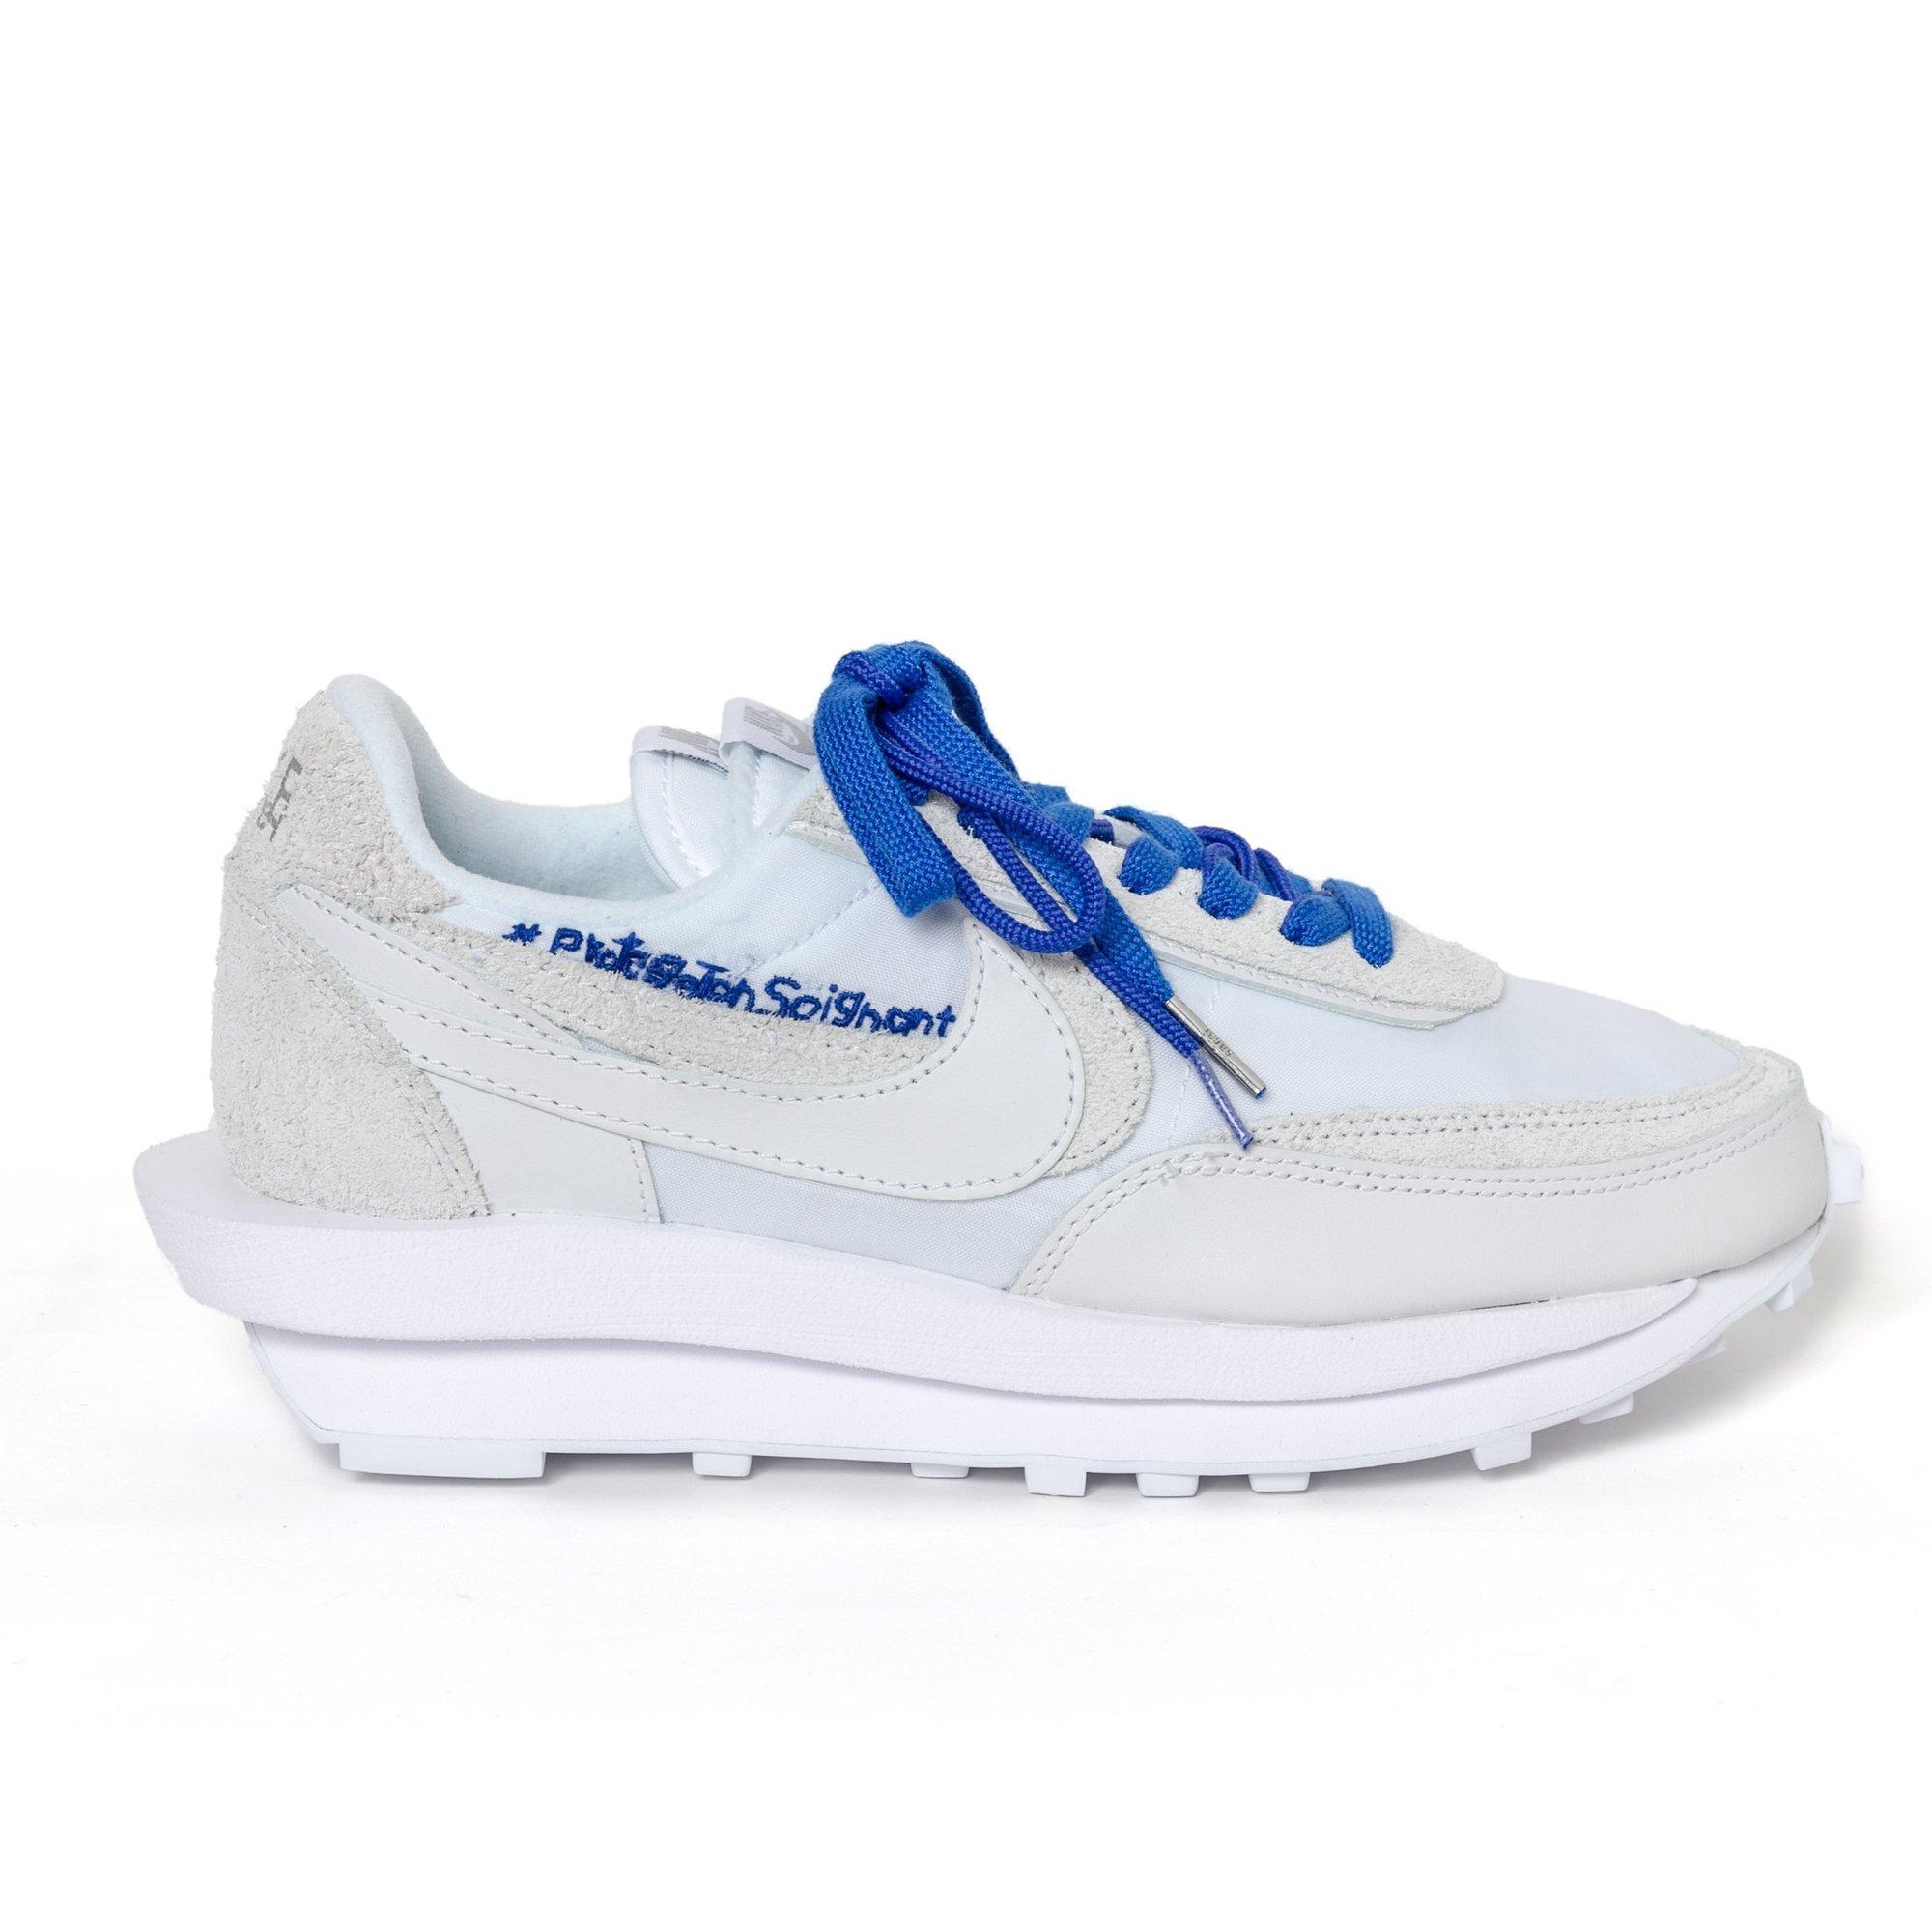 Sacai Made Custom Nike LDWaffles For COVID-19 Relief